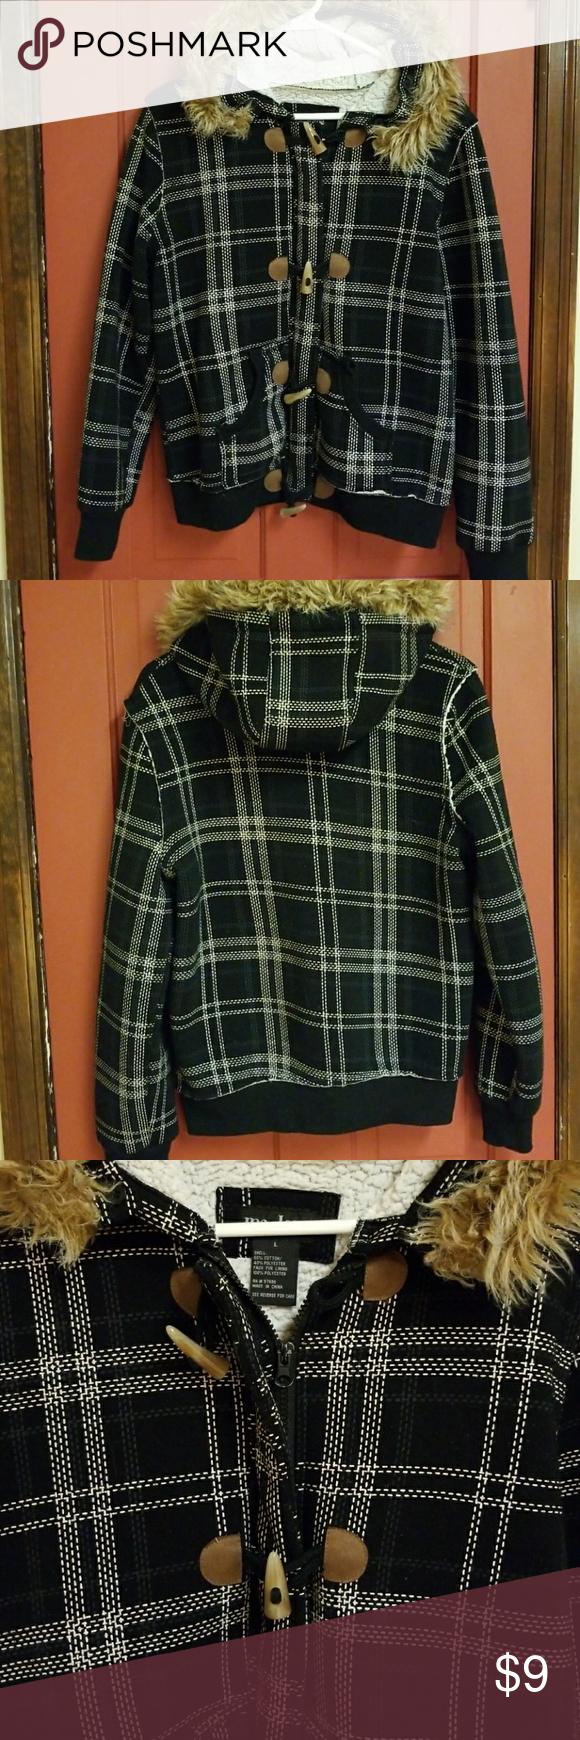 Flannel shirt apron  Me Jane flannelfur lining bomber jacket SzMed  Flannels Fur and Hoods